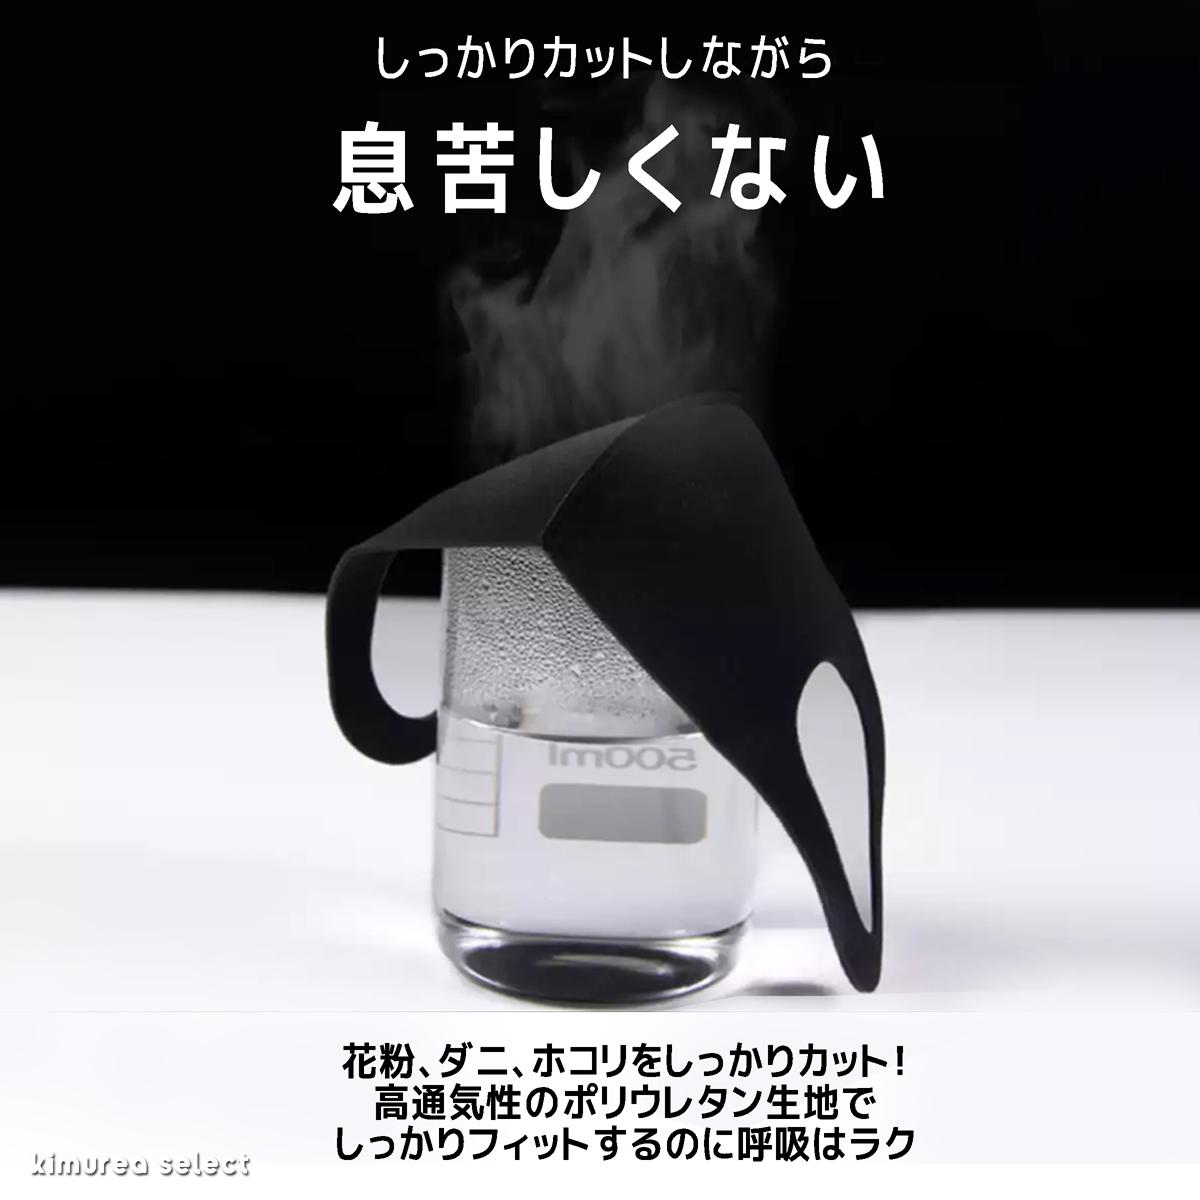 MOSCHINO masks fashionable protection reusable cotton face mask